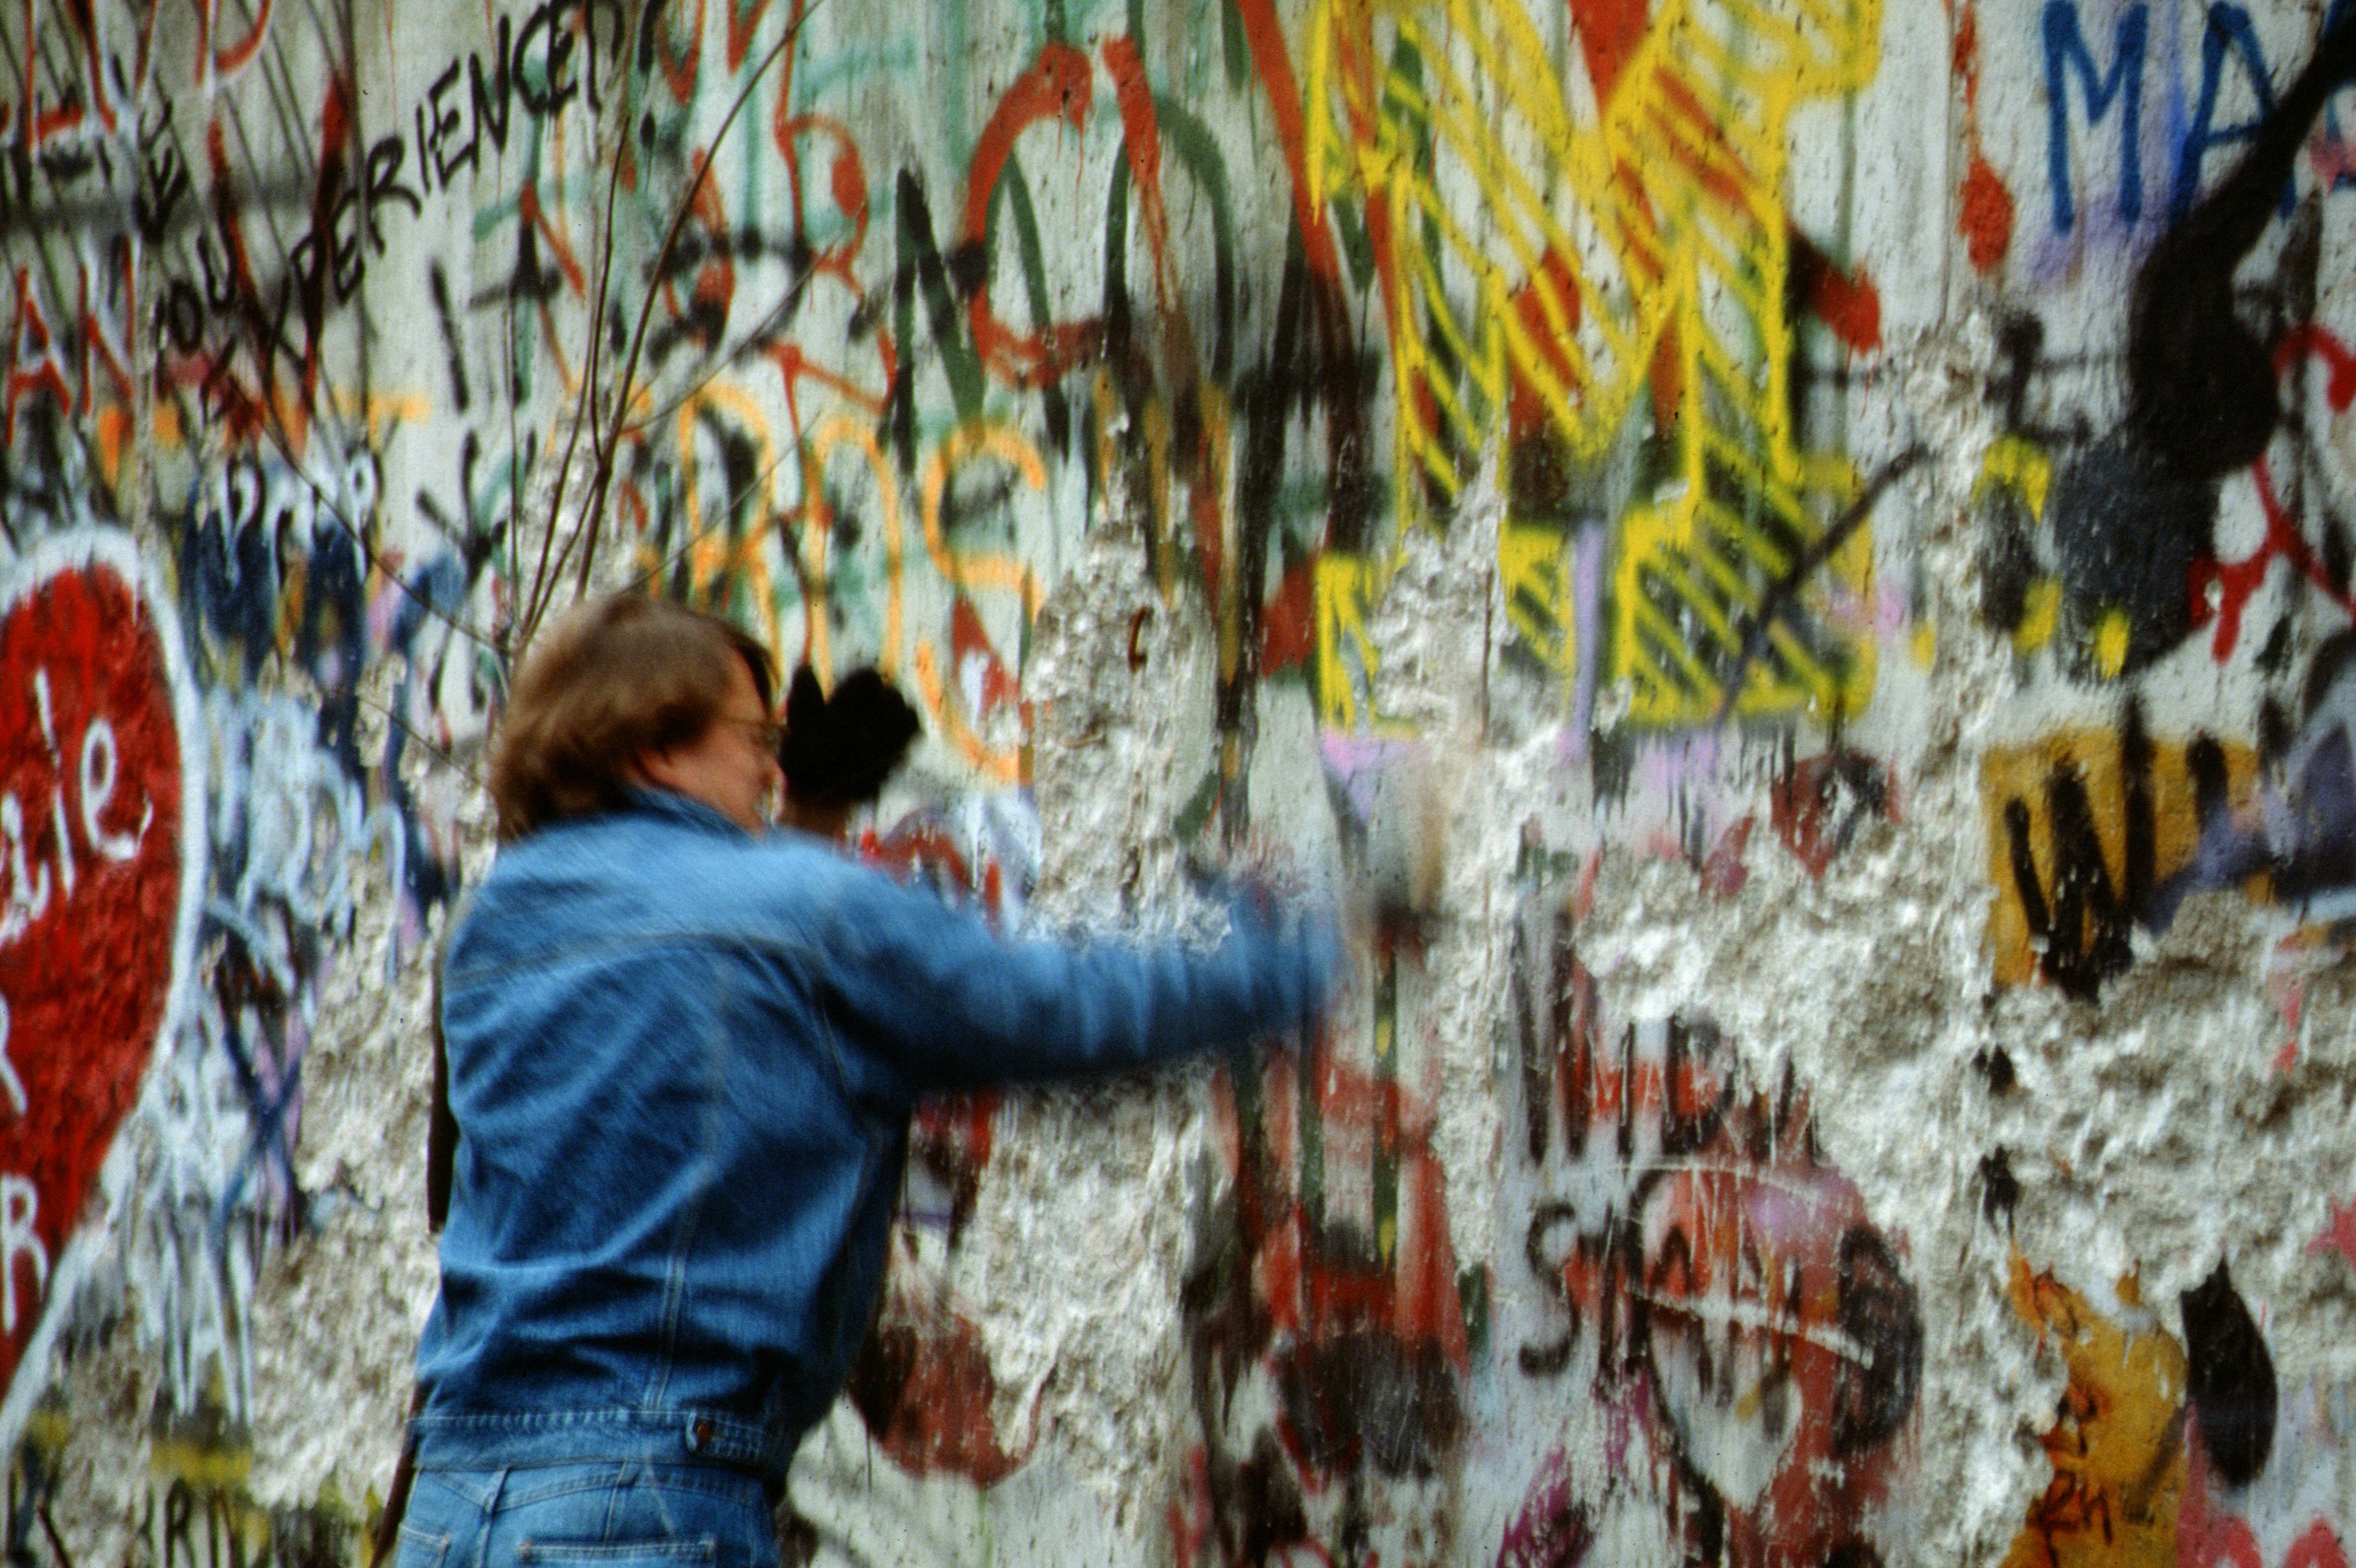 file berlin 1989 fall der mauer chute du mur. Black Bedroom Furniture Sets. Home Design Ideas